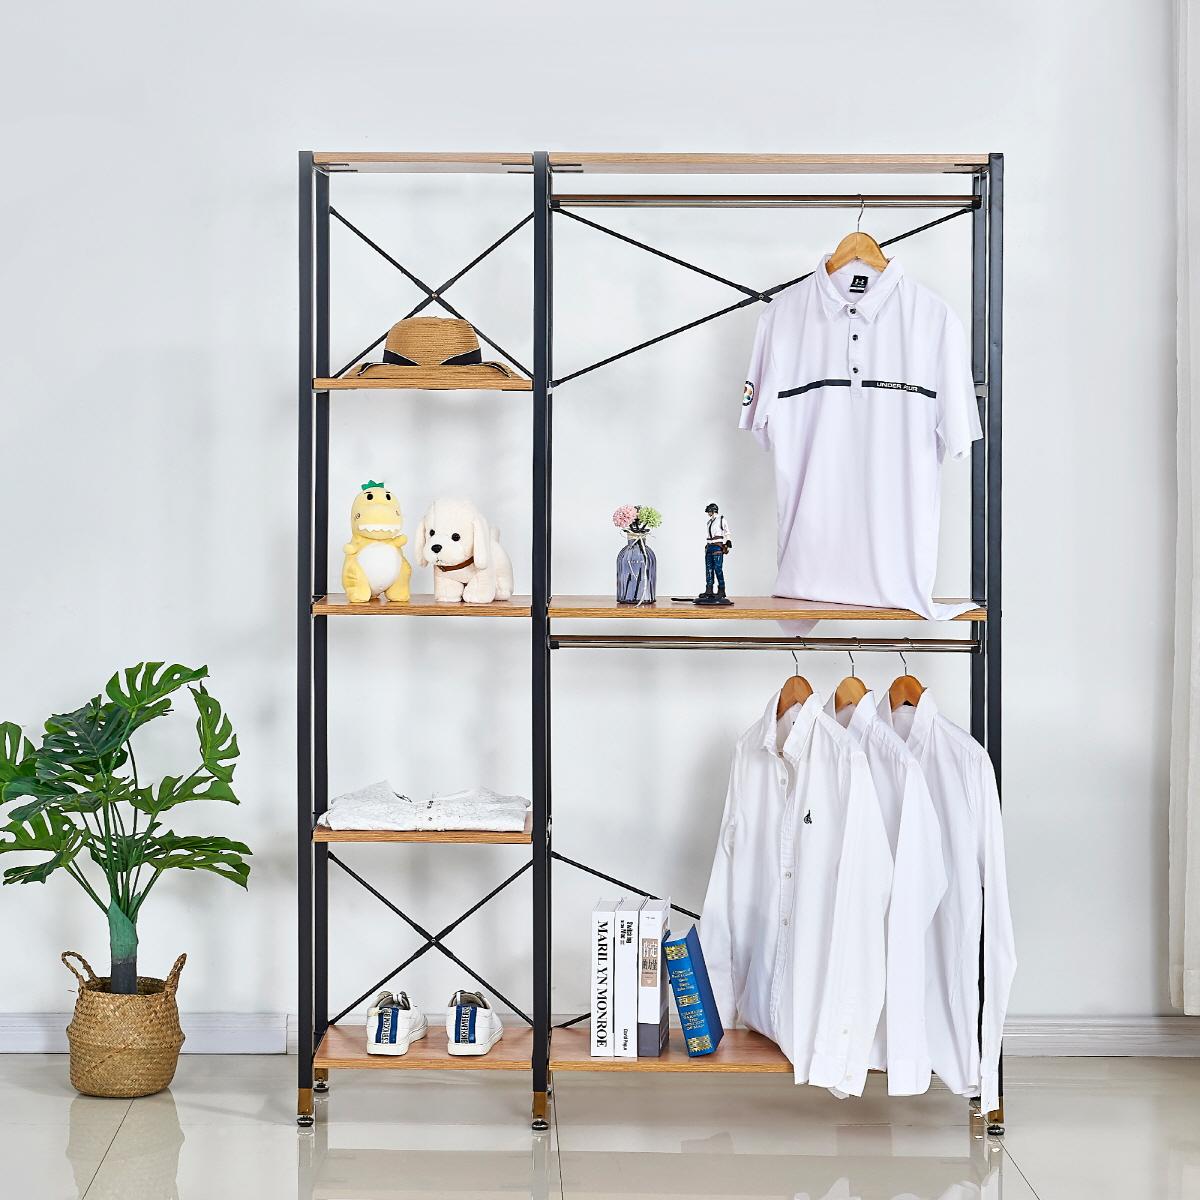 modern metal frame wooden hanging clothes closet shelving wardrobe cabinet drawer underwear organizer dividers buy closet organizer closet system